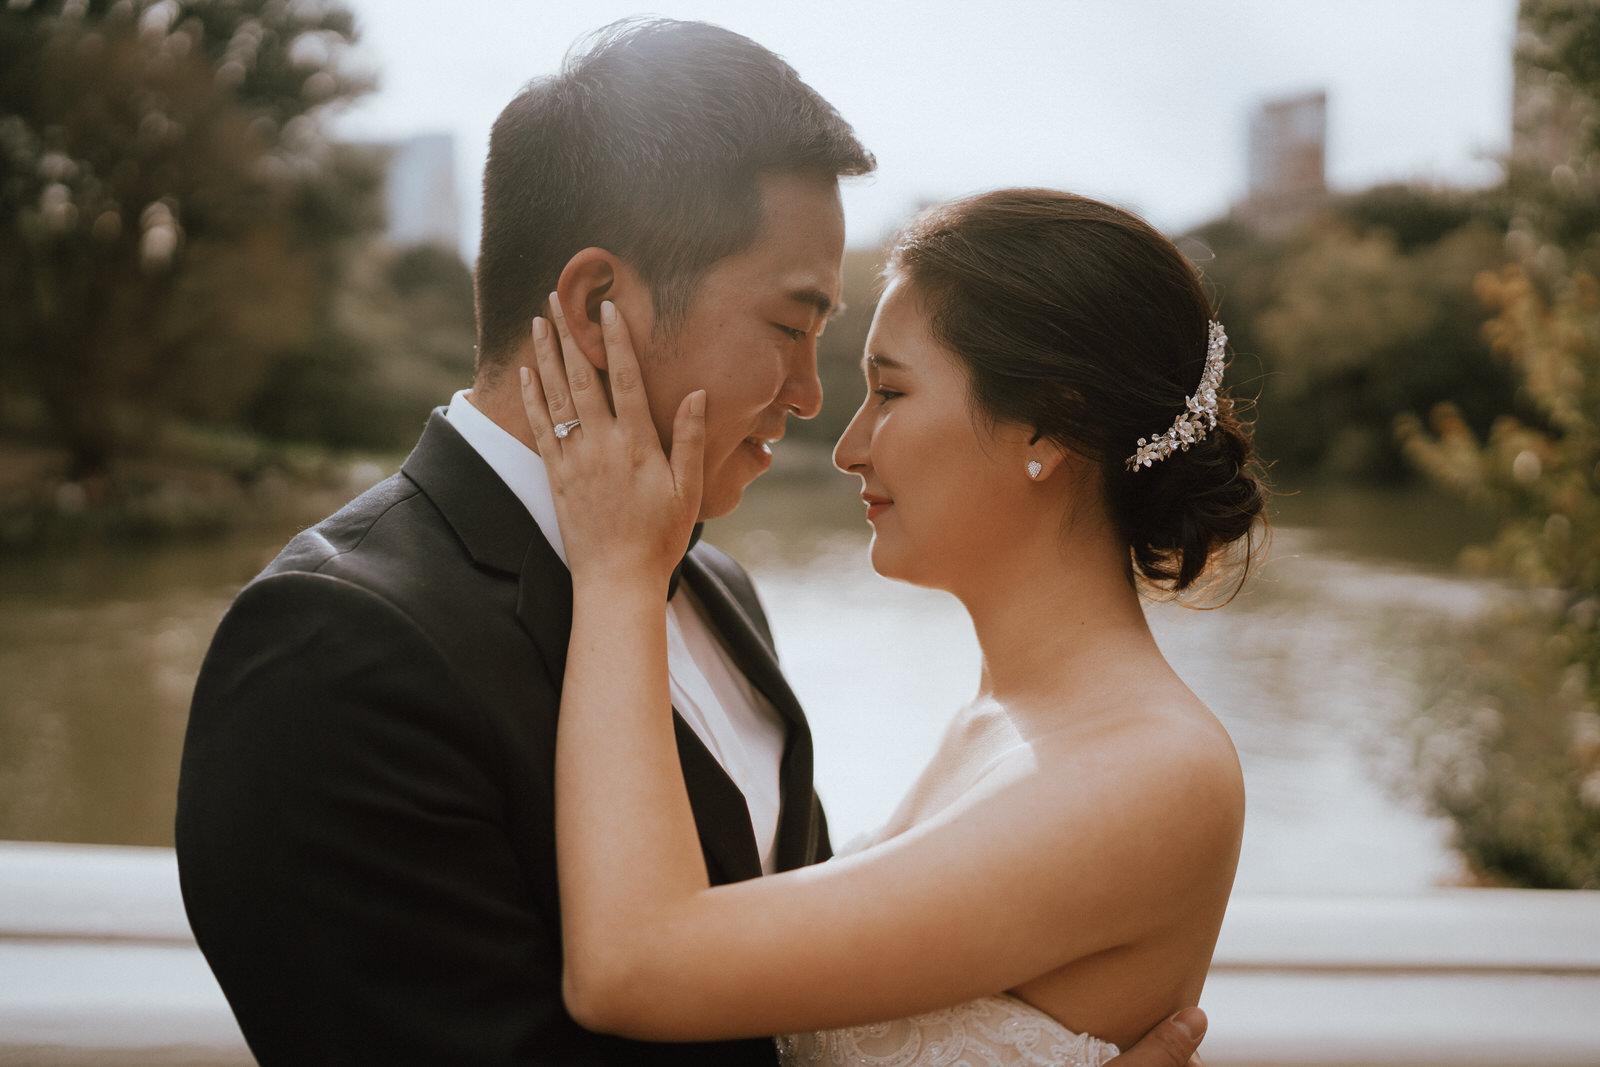 Central Park Elopement Photos-Bow Bridge-Michelle Gonzalez Photography- New York Wedding Photographer-32.jpg